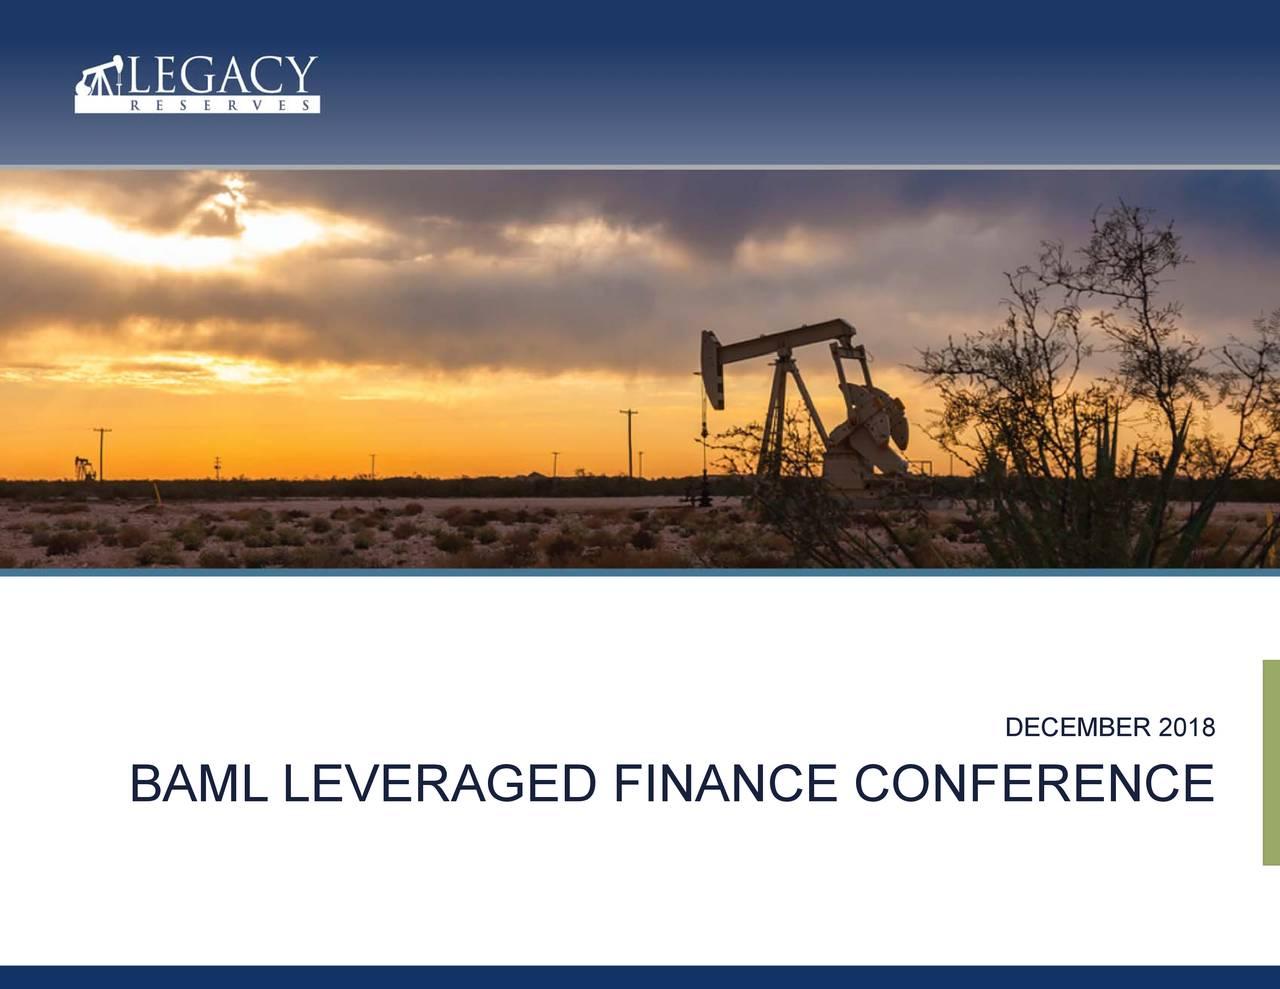 BAML LEVERAGED FINANCE CONFERENCE